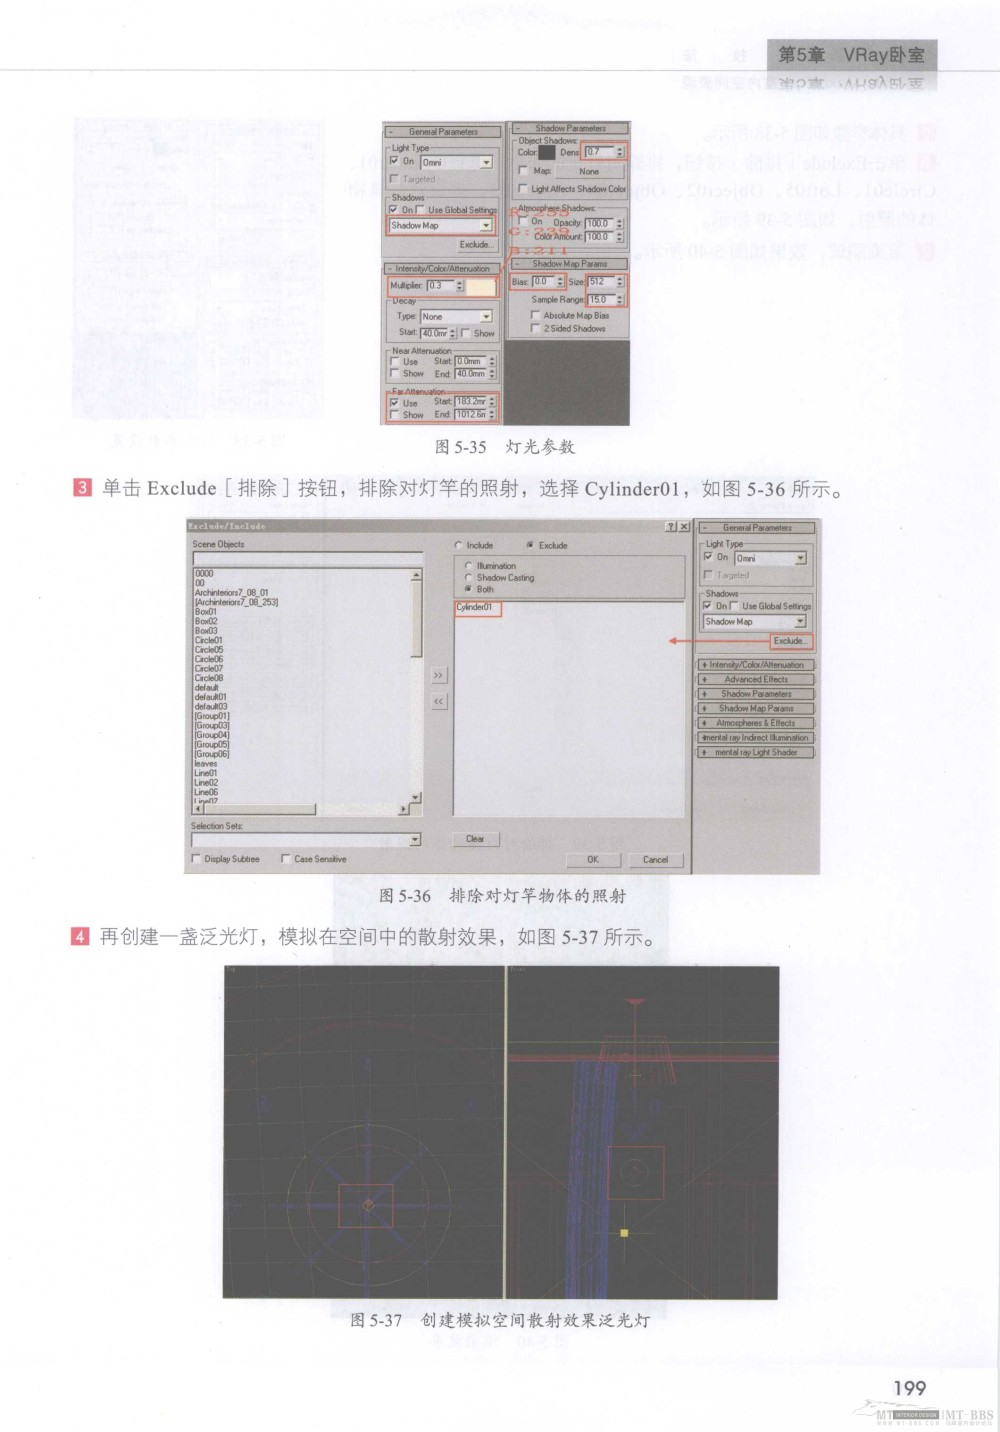 水晶石技法-3ds_Max&VRay室内空间表现_水晶石技法-3ds_Max&VRay室内空间表现_页面_205.jpg